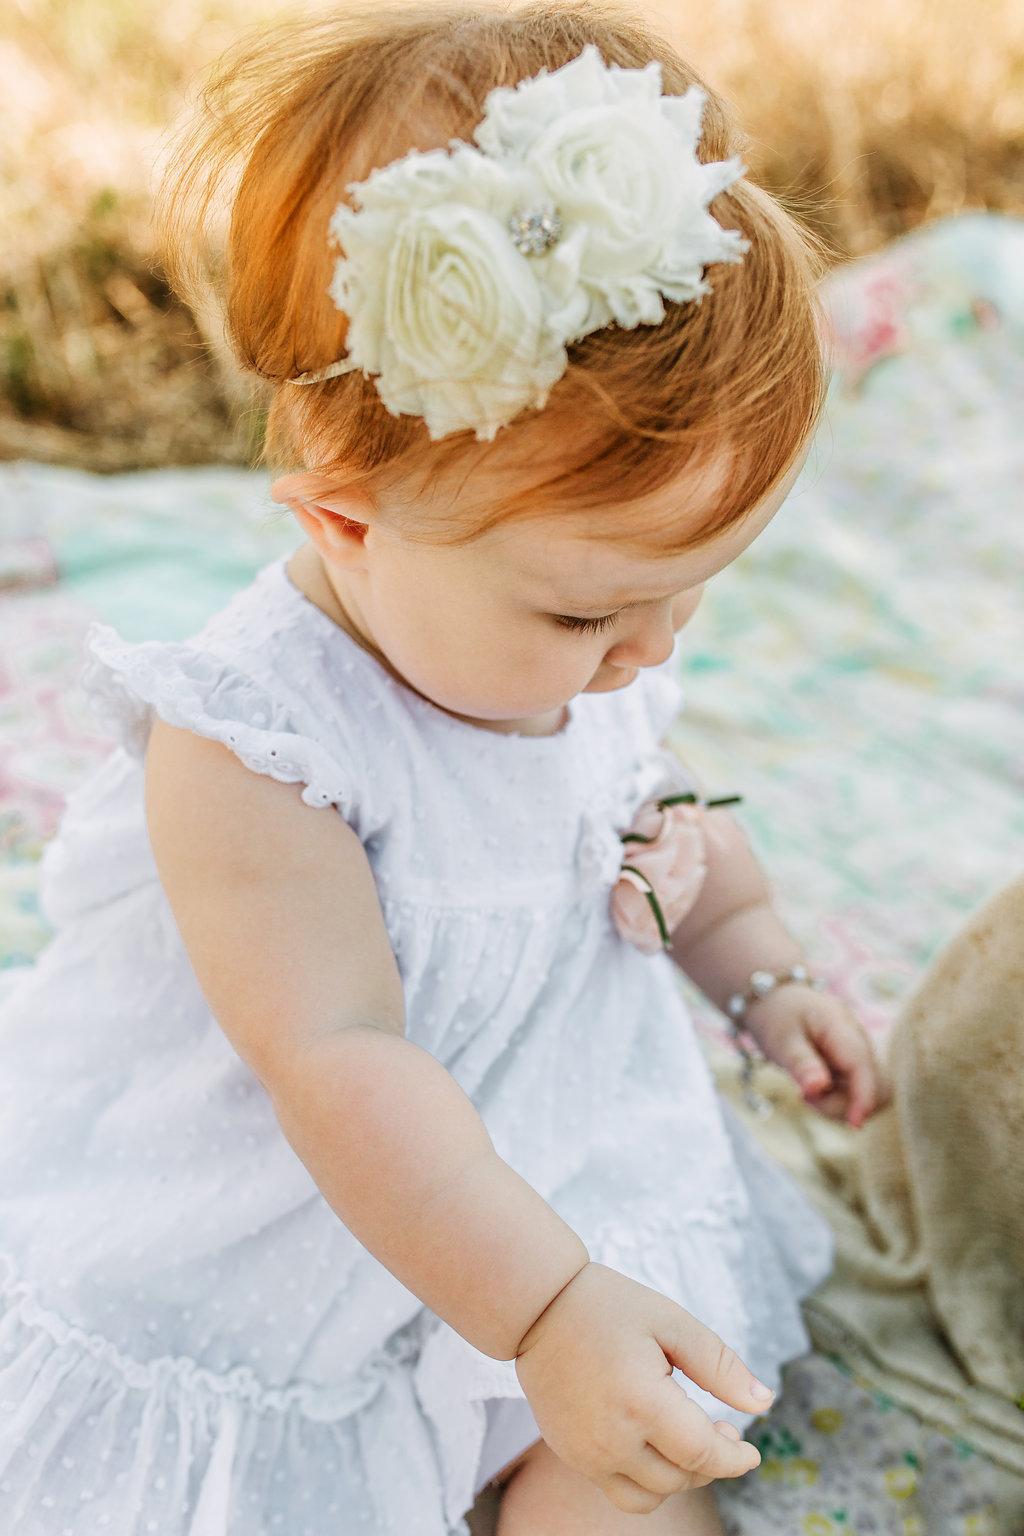 Flower-Headband-White-Dress-Baby-First-Birthday-Girl